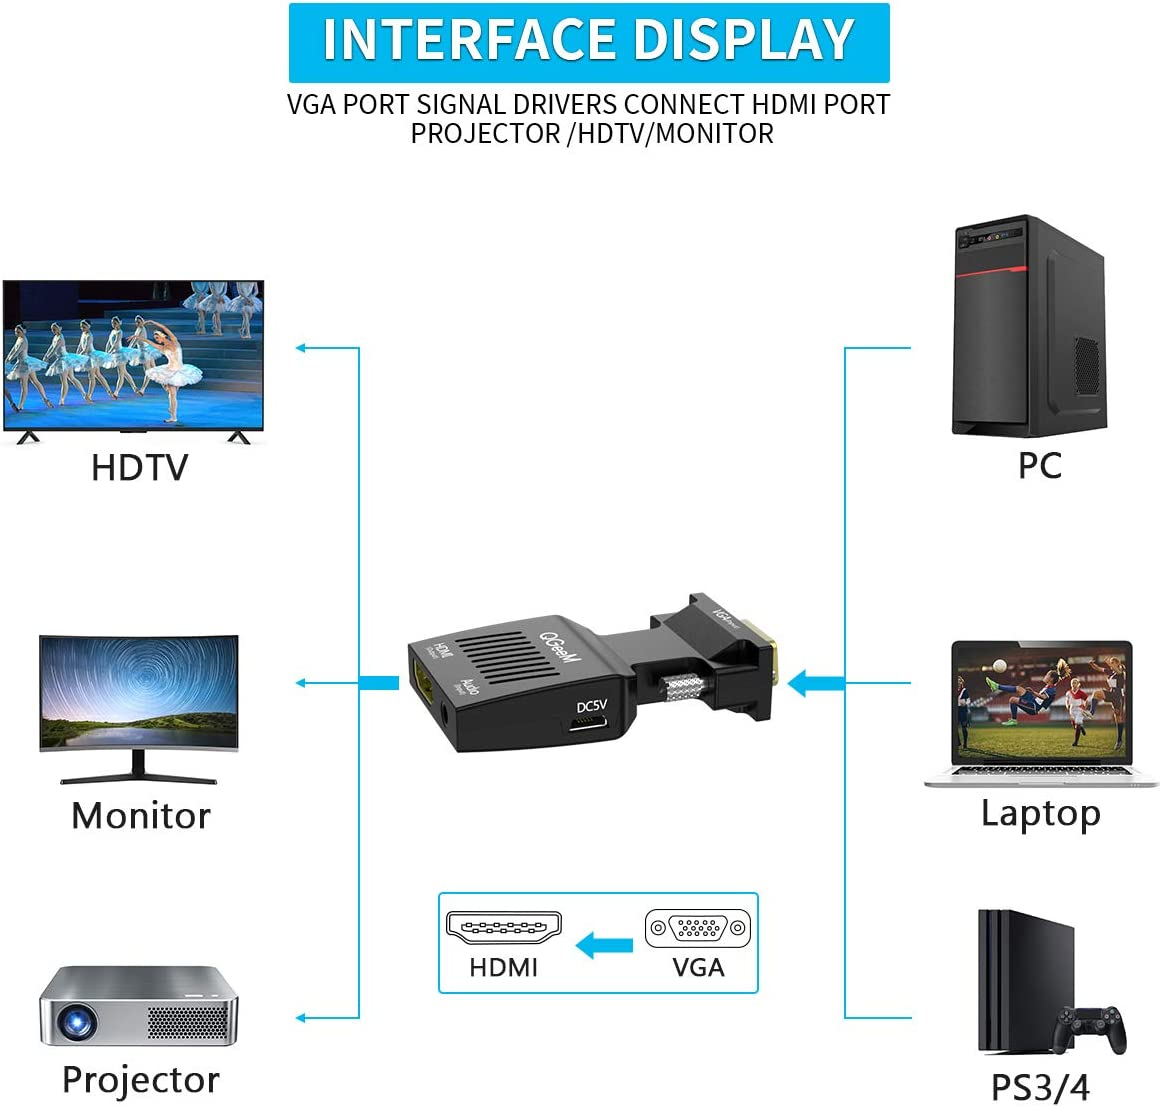 Projektor VGA auf HDMI Adapter,QGeeM VGA zu HDMI Adapter mit Audio//1080p Video-Ausgang VGA auf HDMI VGA zu HDMI Konverter Laptop Konverter Dongle Adapter f/ür Monitor Computer Stecker auf Buchse